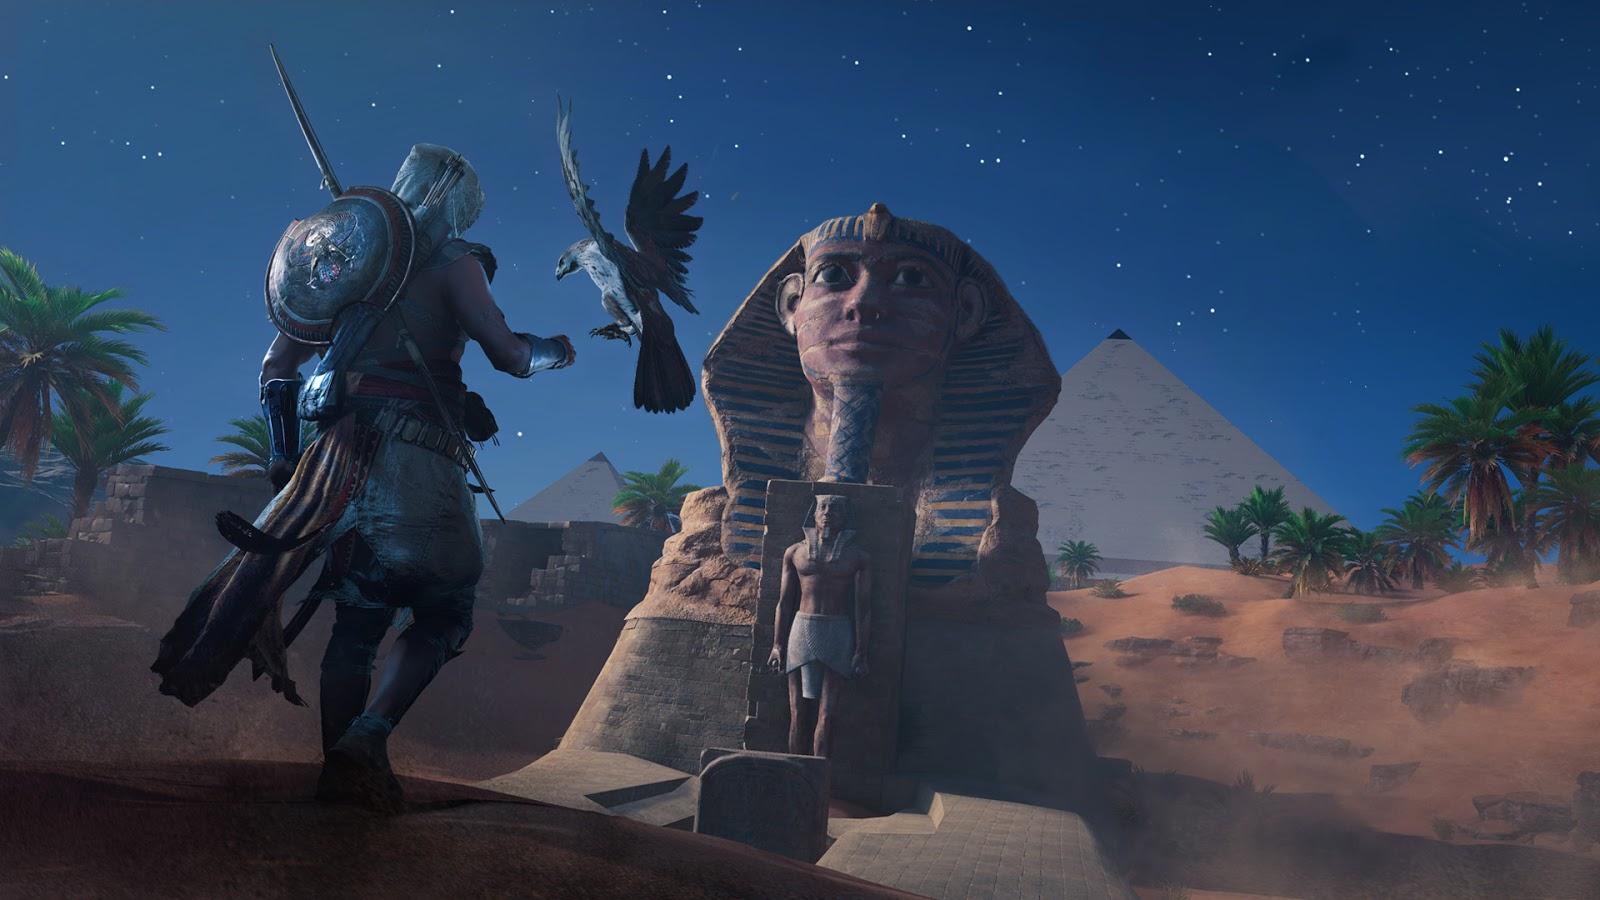 Assassin's Creed Origins The Curse Of The Pharaohs PC ESPAÑOL + Crackfix (CODEX) + REPACK 11 DVD5 (JPW) 8